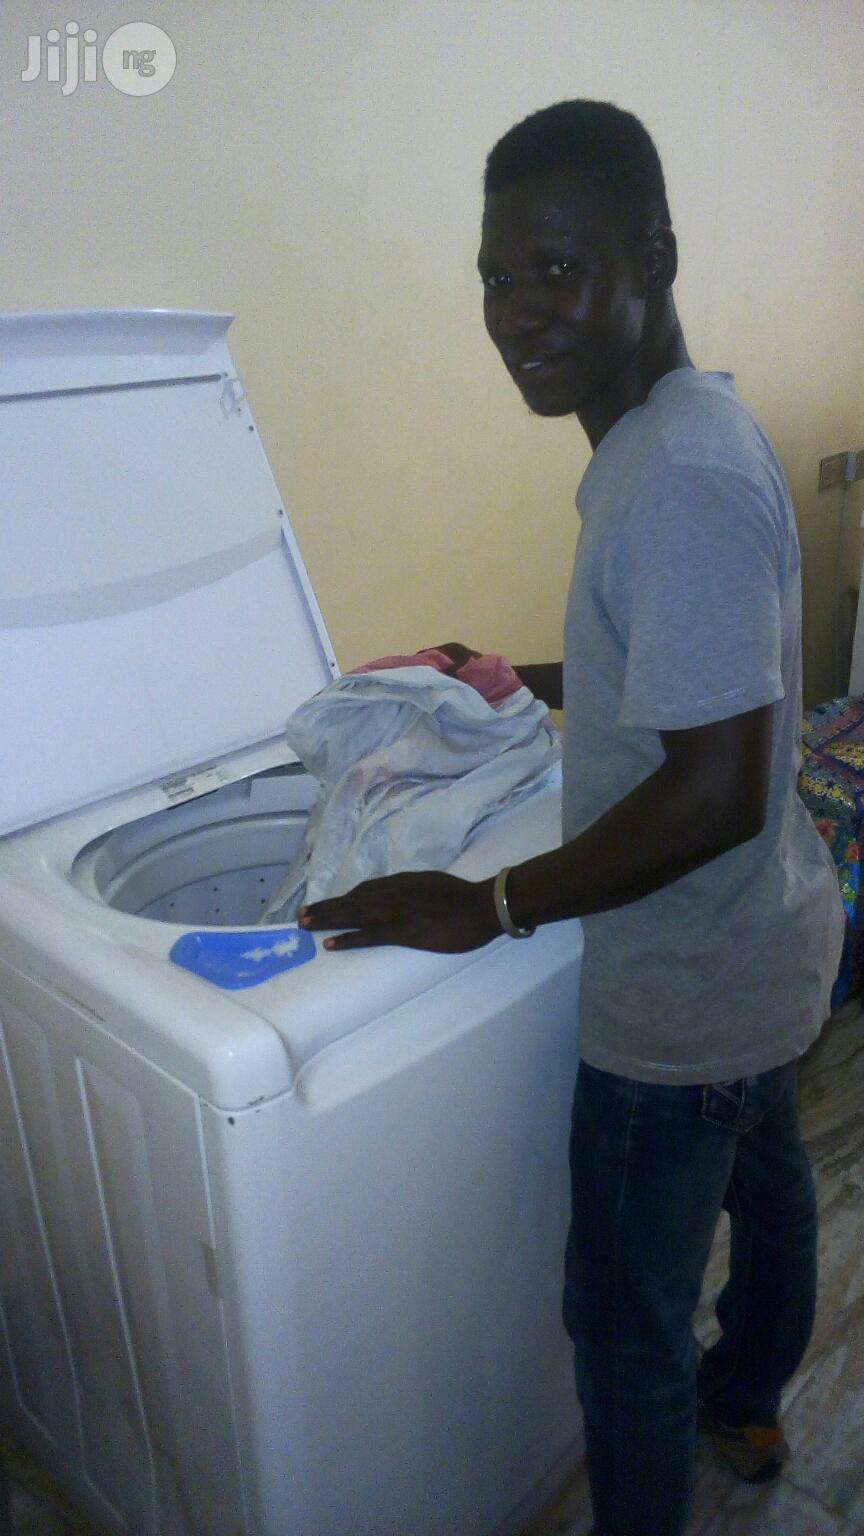 Seeking For House Laundryman Job